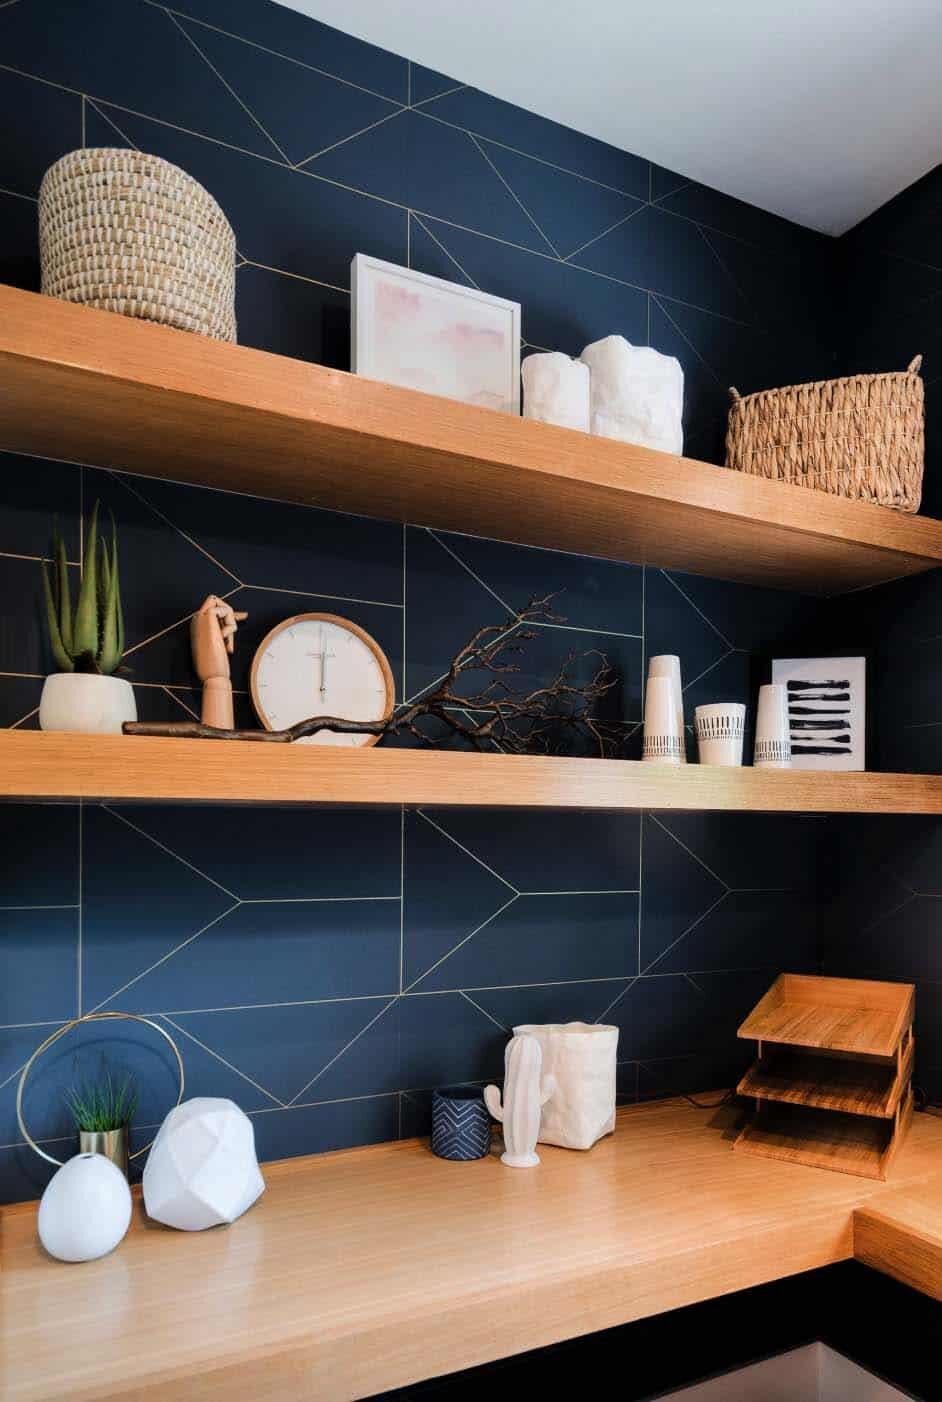 Organic-Modern-Style-Home-Urbanology-Designs-23-1-Kindesign.jpg